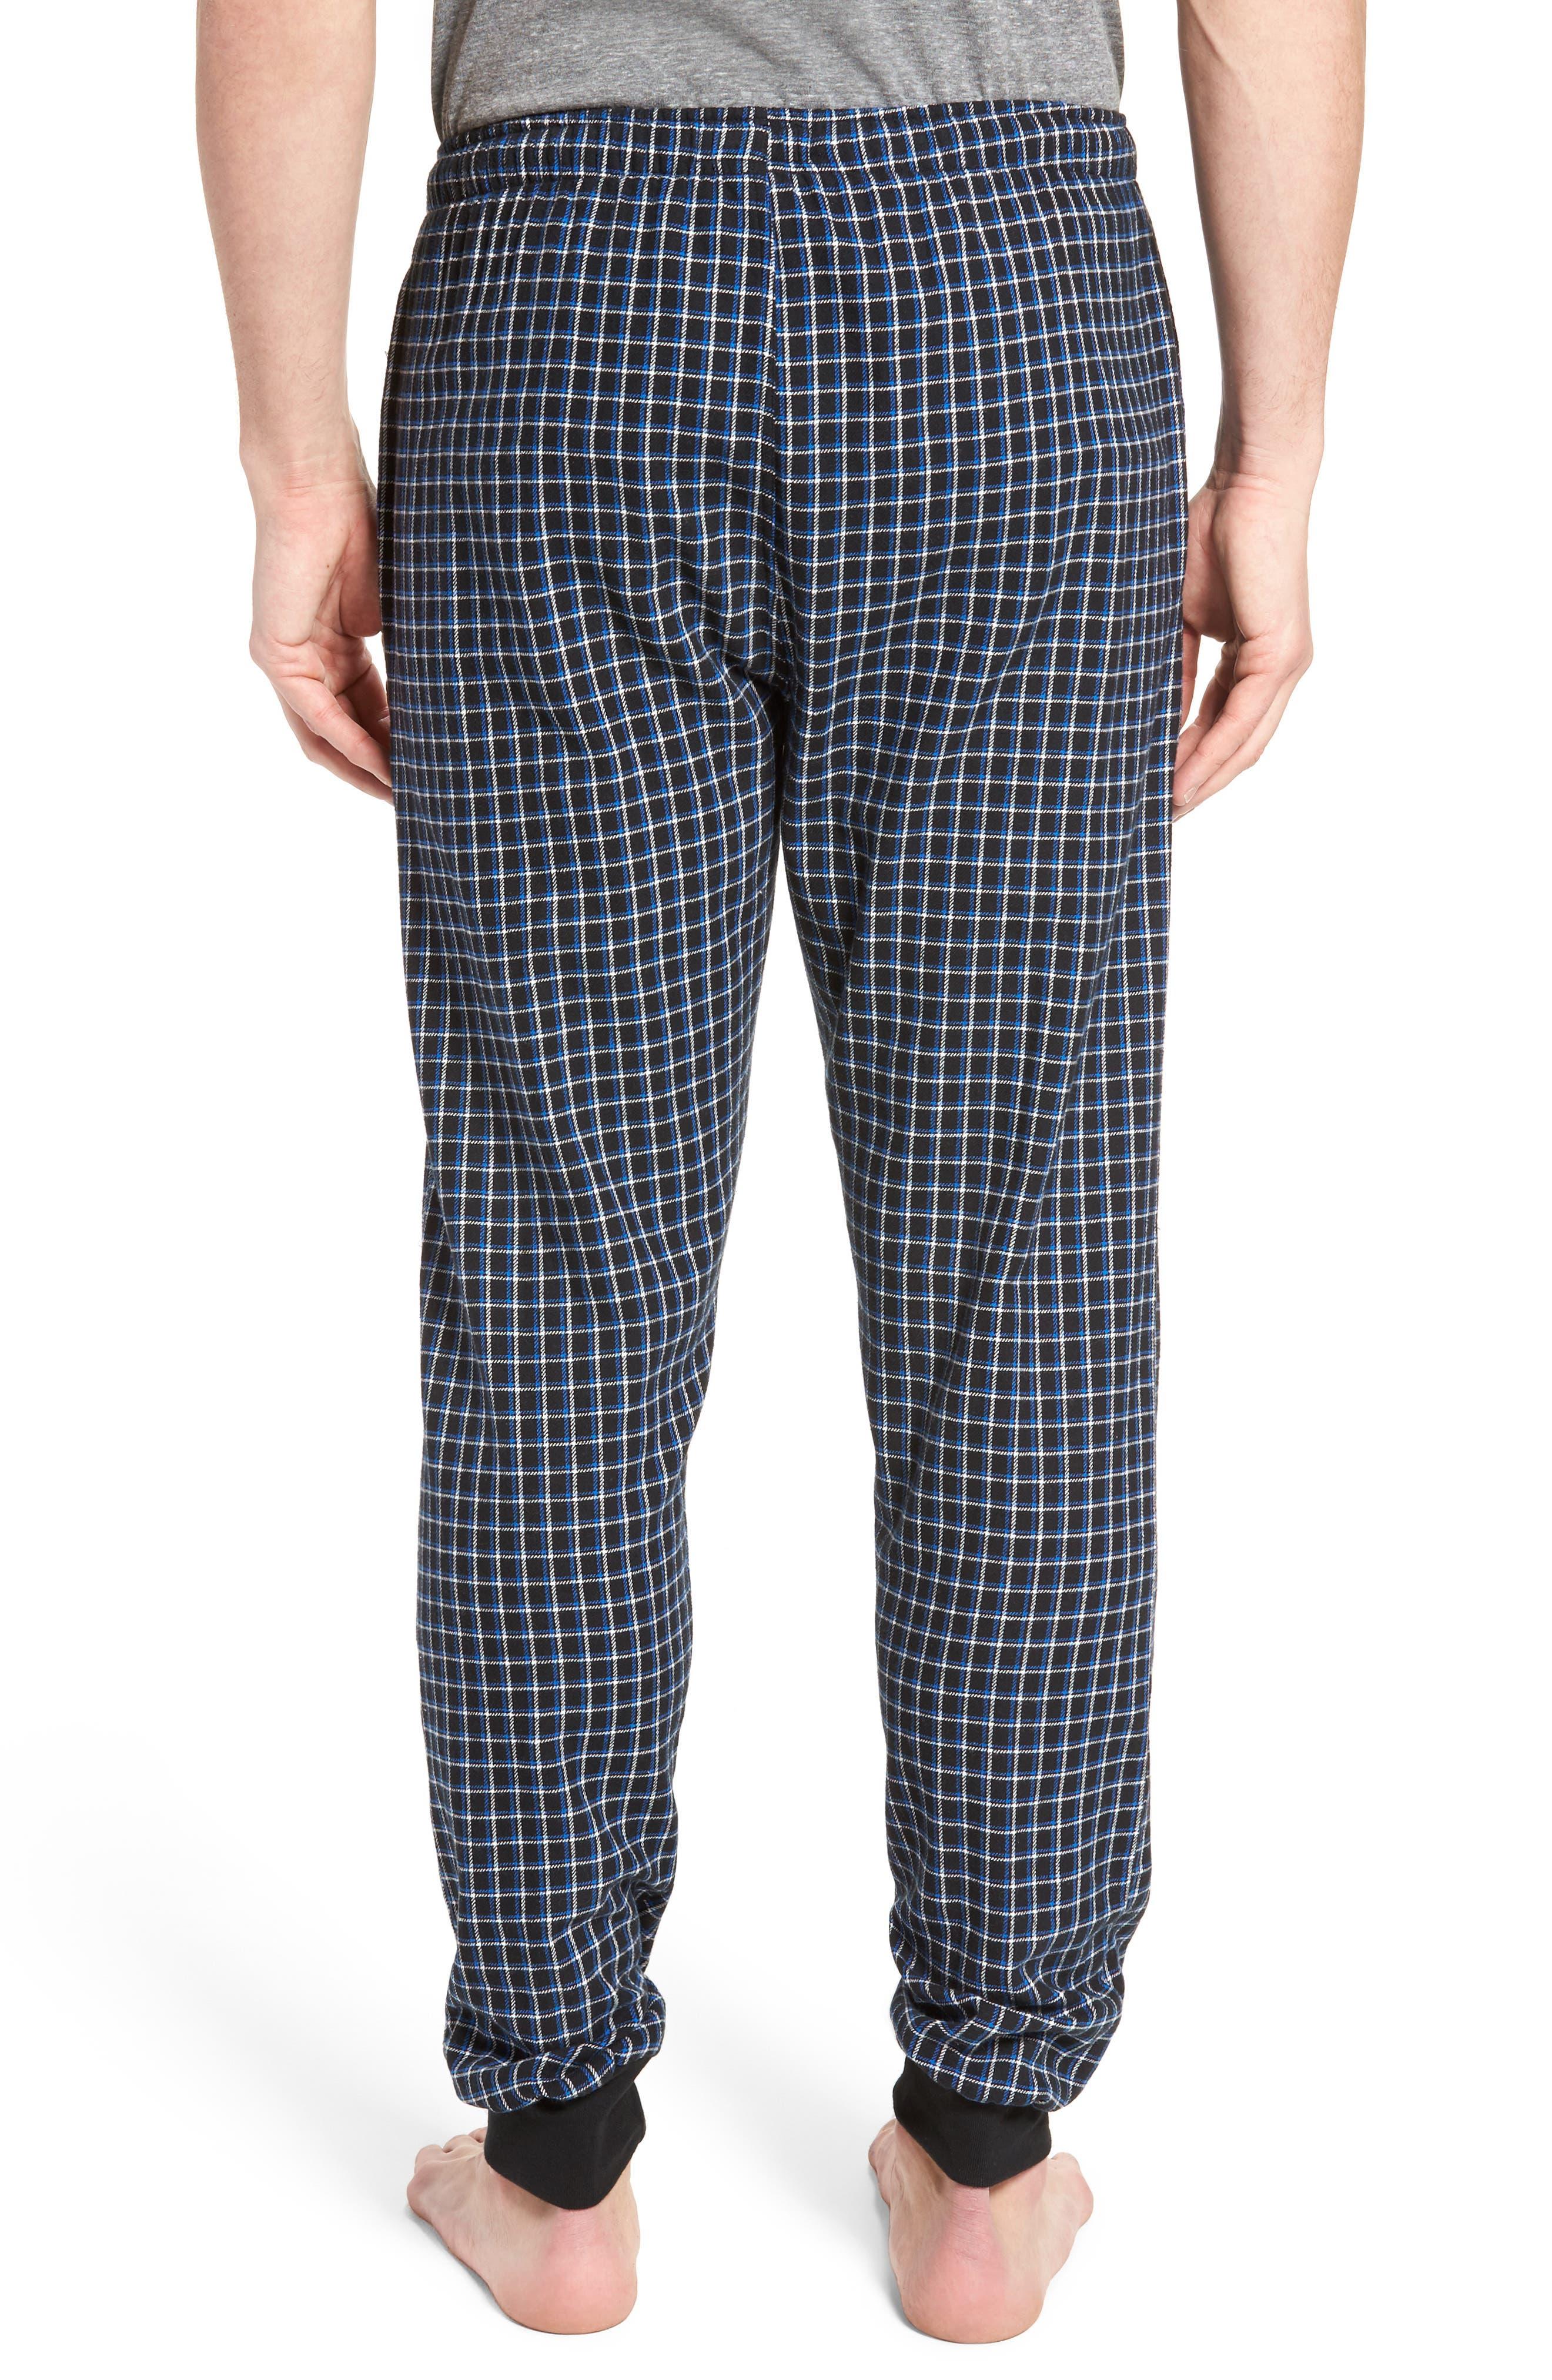 Flannel Pajama Jogger Pants,                             Alternate thumbnail 2, color,                             Logan Plaid/ Crescent Cream